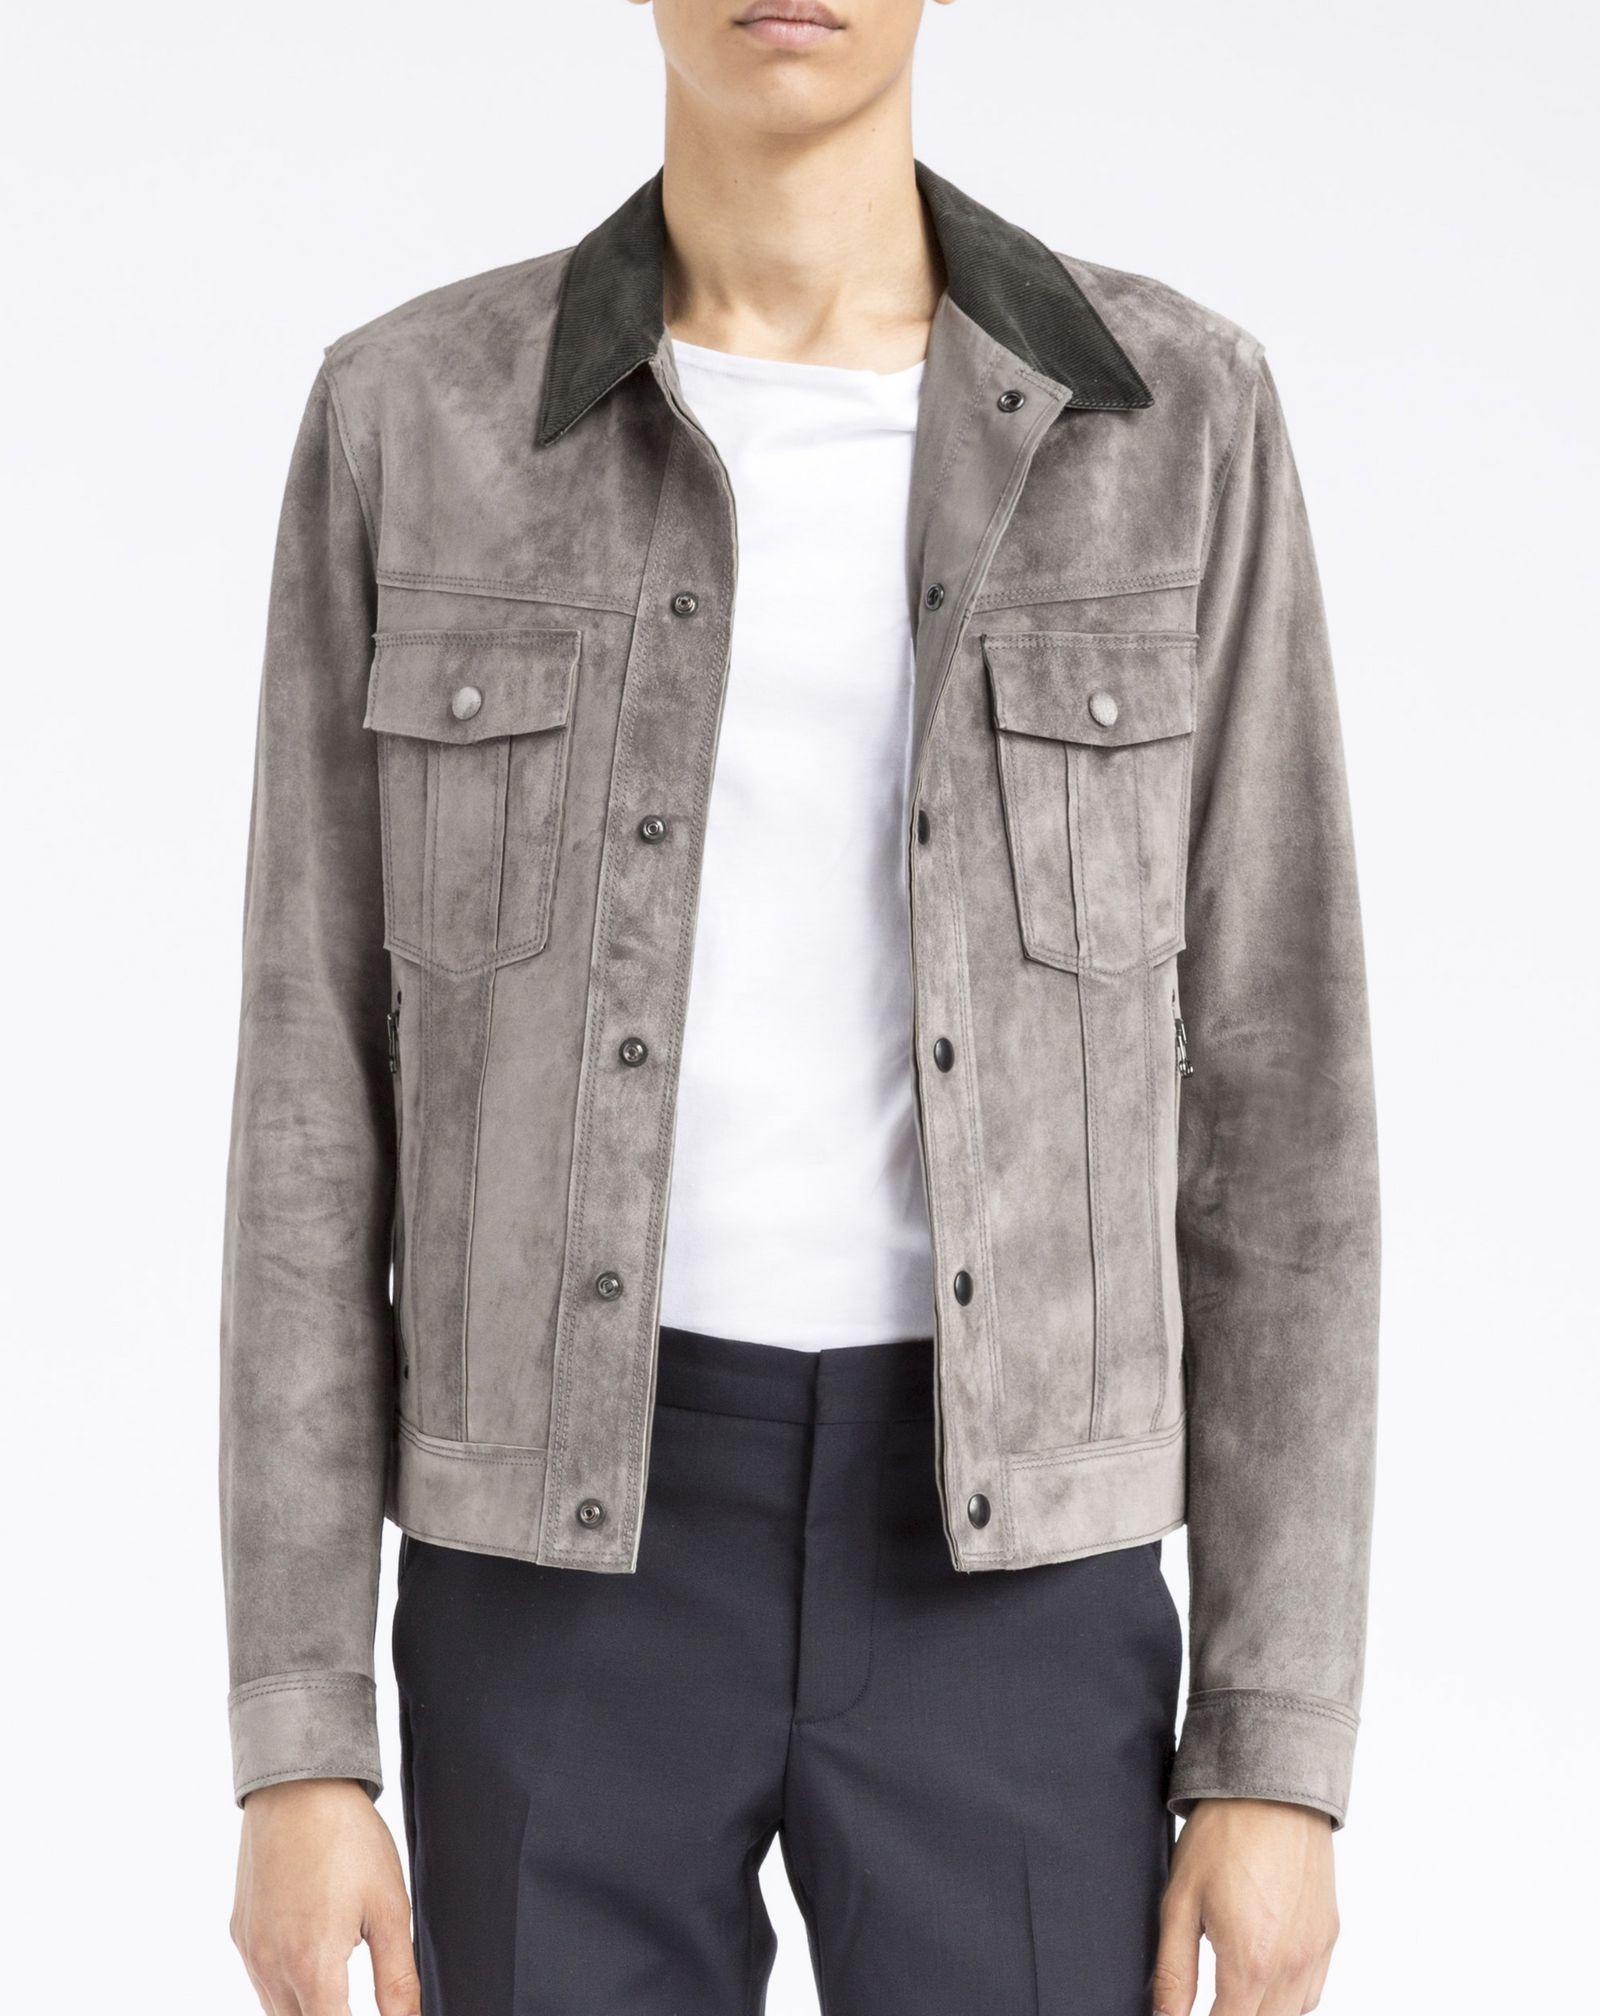 Lanvin Suede Jacket, Outerwear Men | Lanvin Online Store